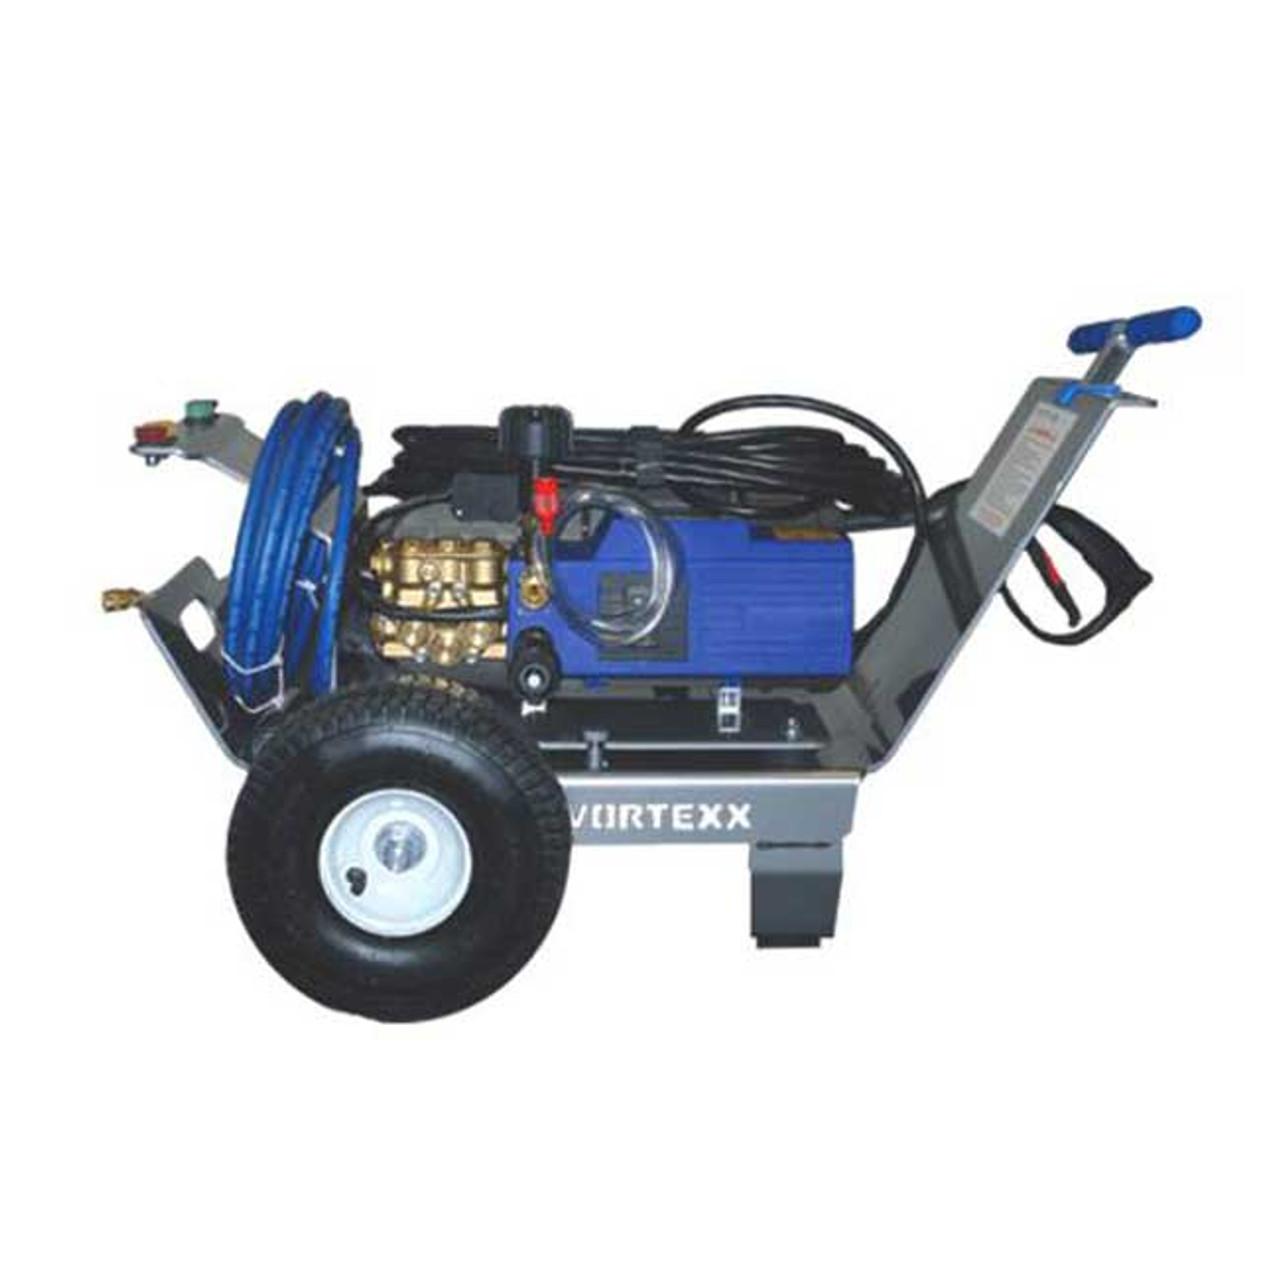 Vortexx 1900 Psi Electric Professional Commercial Pressure